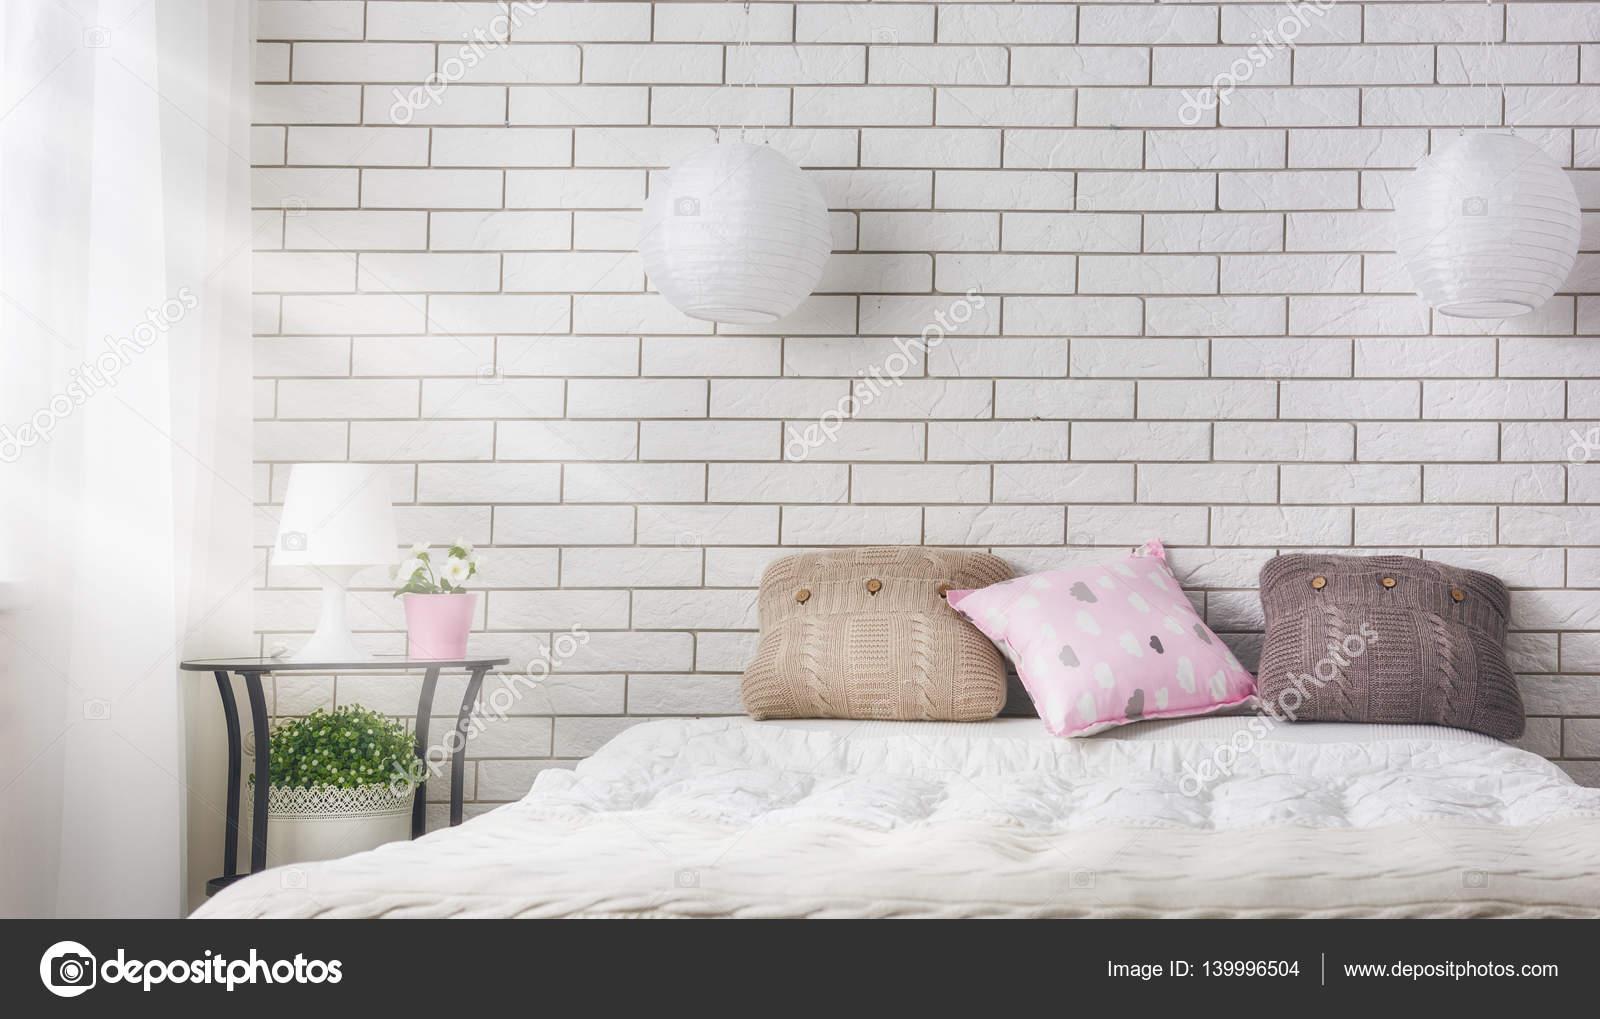 52e9c10c5fb υπνοδωμάτιο σε απαλά ανοιχτά χρώματα — Φωτογραφία Αρχείου ...